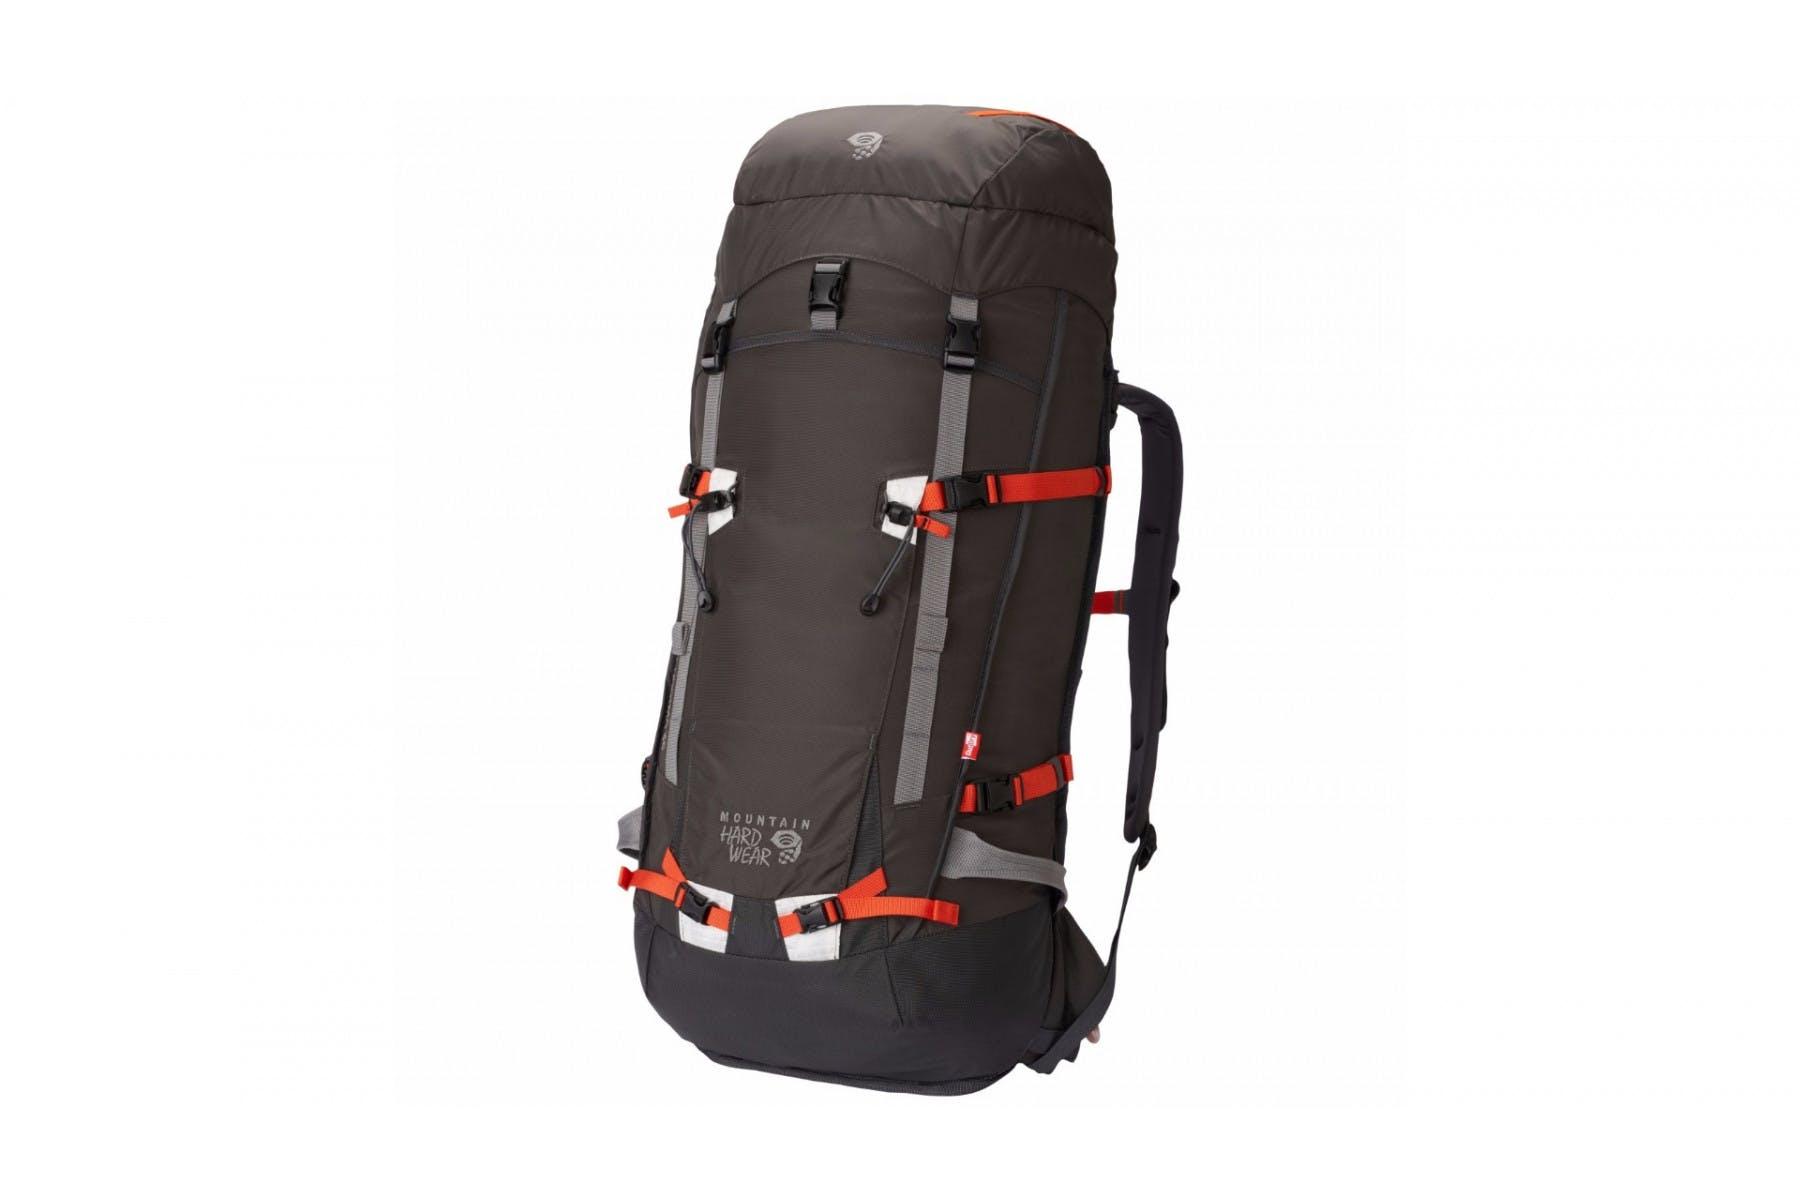 Mountain Hardwear - Direttissima 35 Outdry Pack - Shark